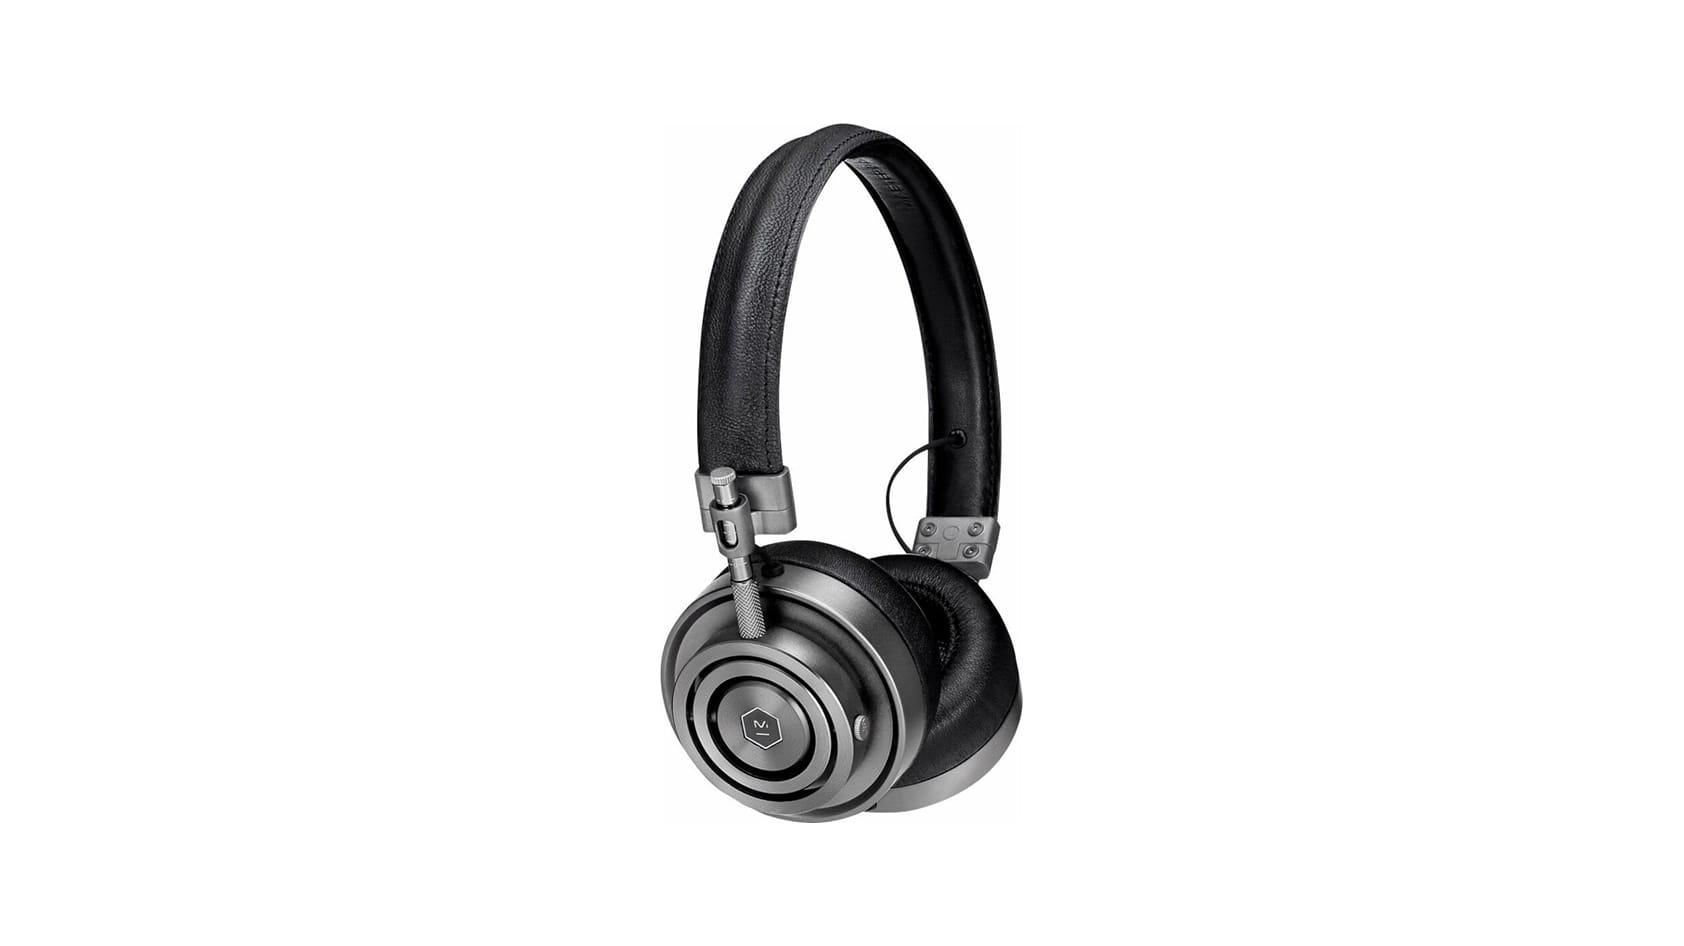 Master & Dynamic - MH30 On-Ear Headphones - Gunmetal/Black Leather $149.98